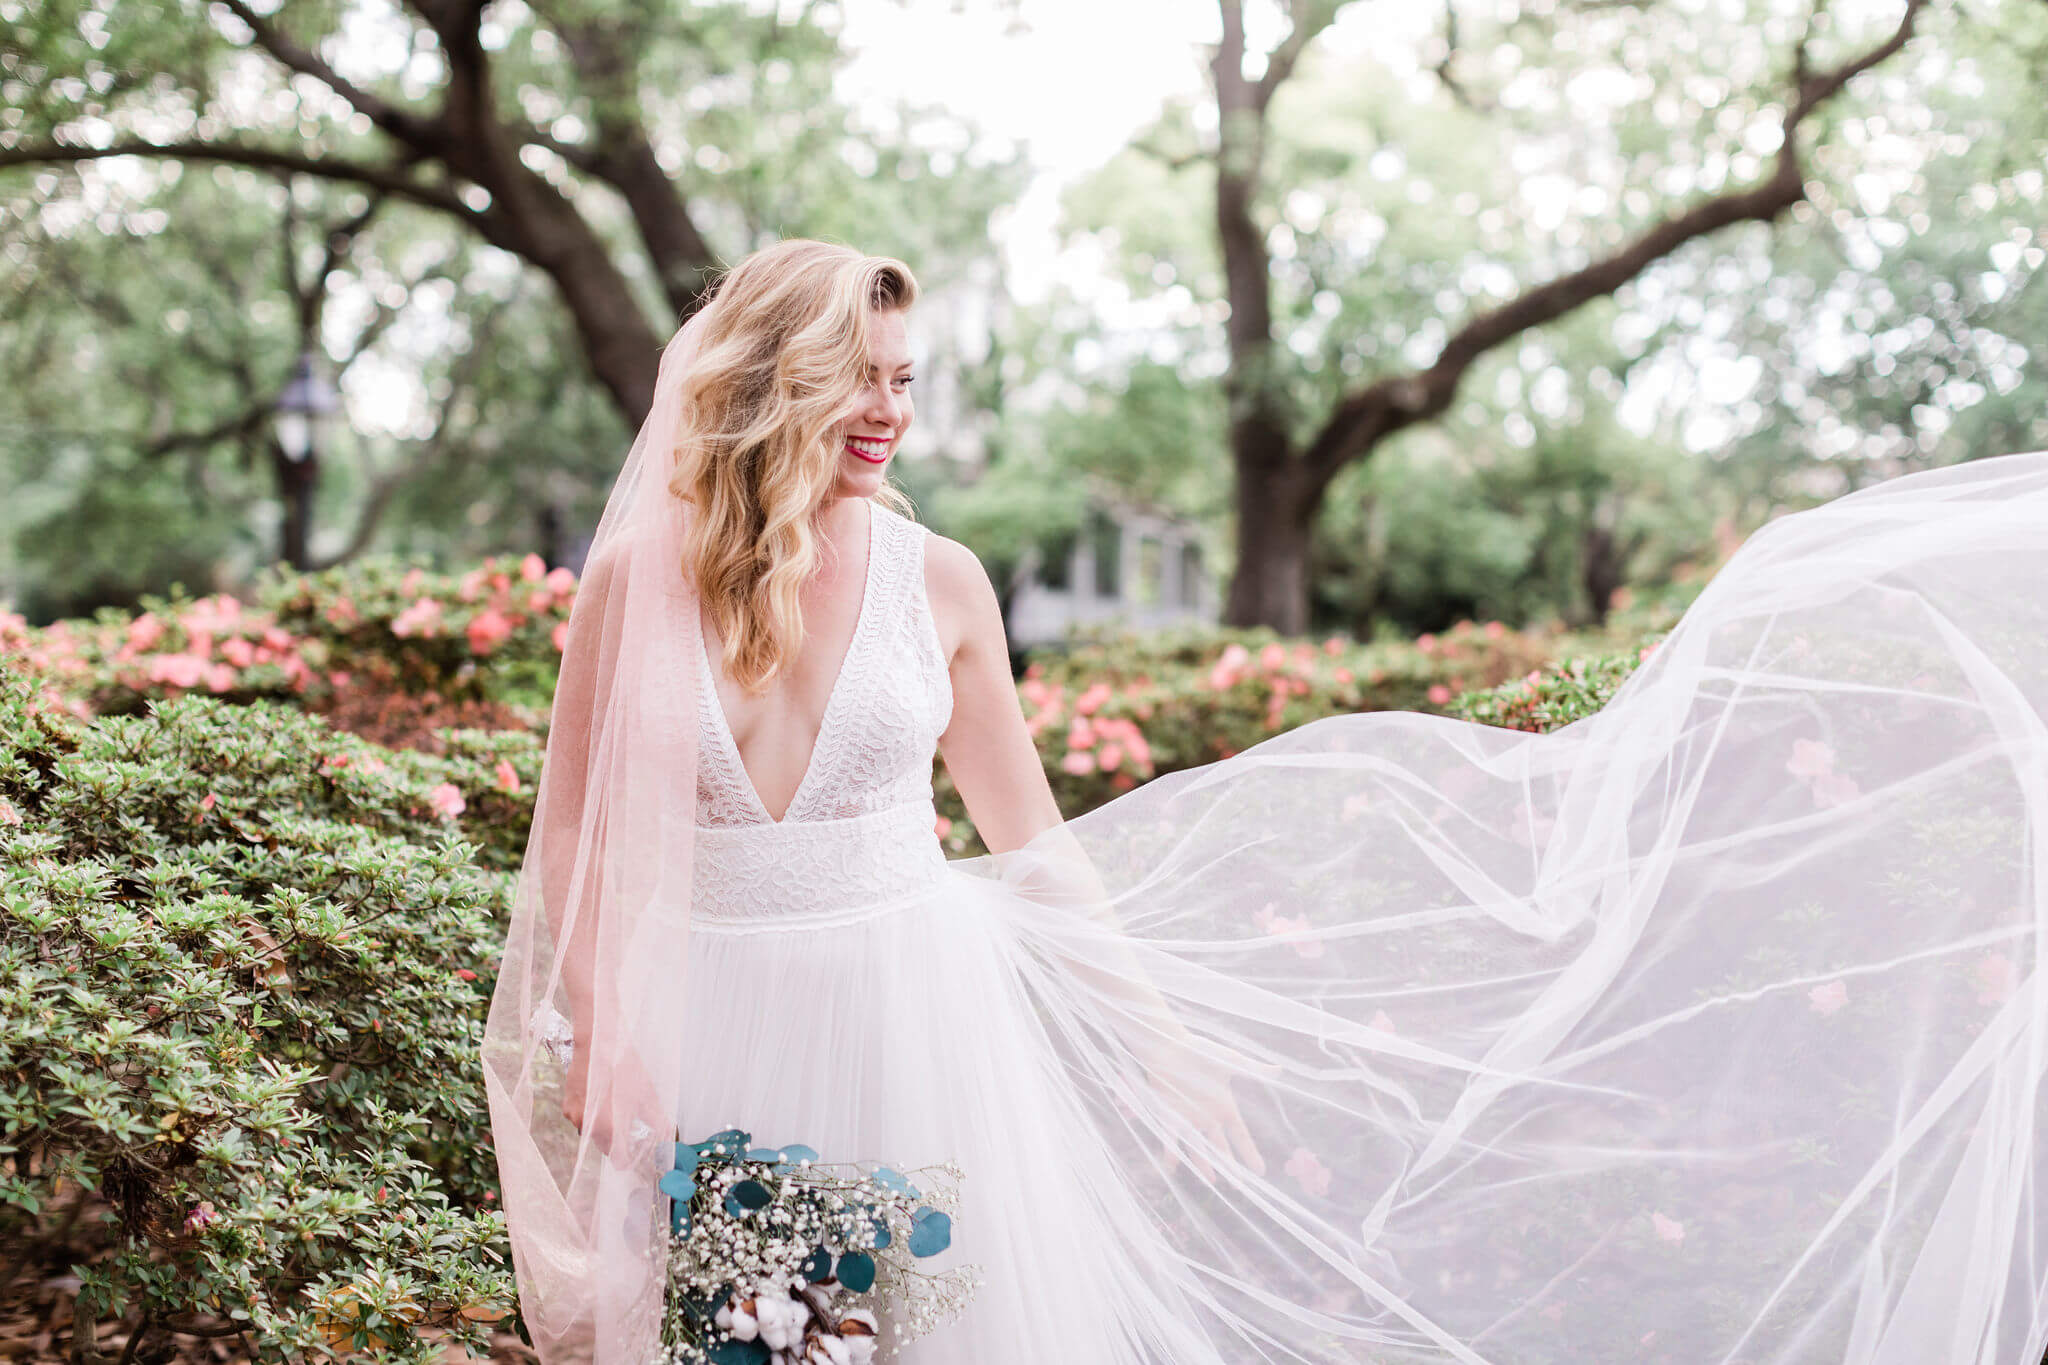 apt-b-photography-savannah-wedding-photographer-savannah-wedding-savannah-elopement-intimate-wedding-photographer-91.jpg